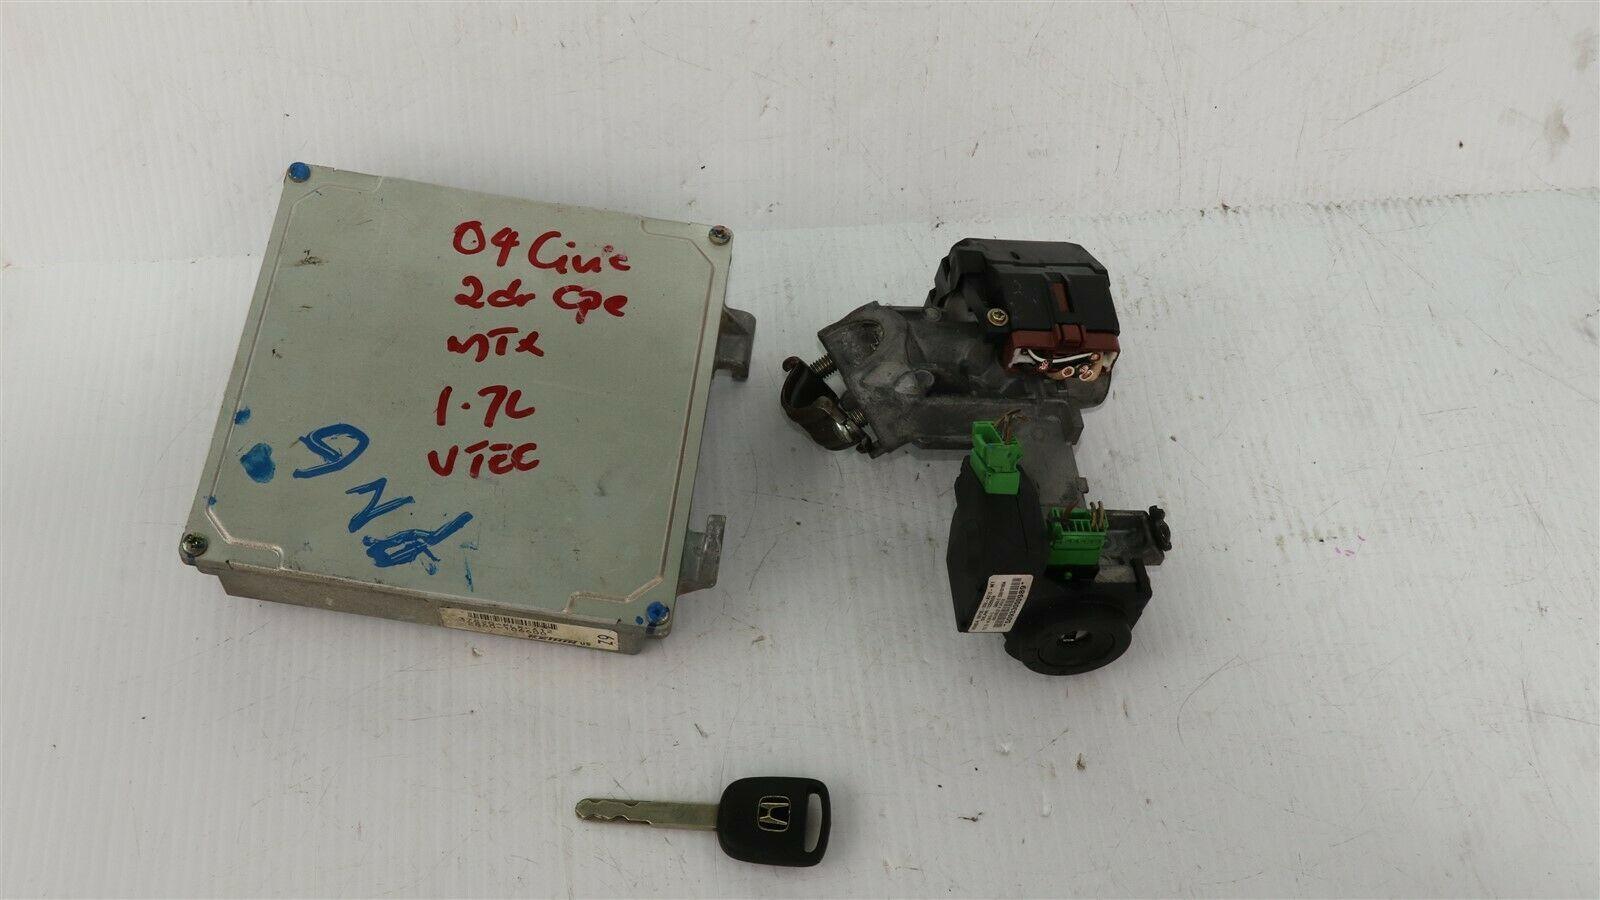 04-05 Honda Civic 1.7 5sp MT ECU PCM Engine Computer & Immobilizer 37820-PLR-A12